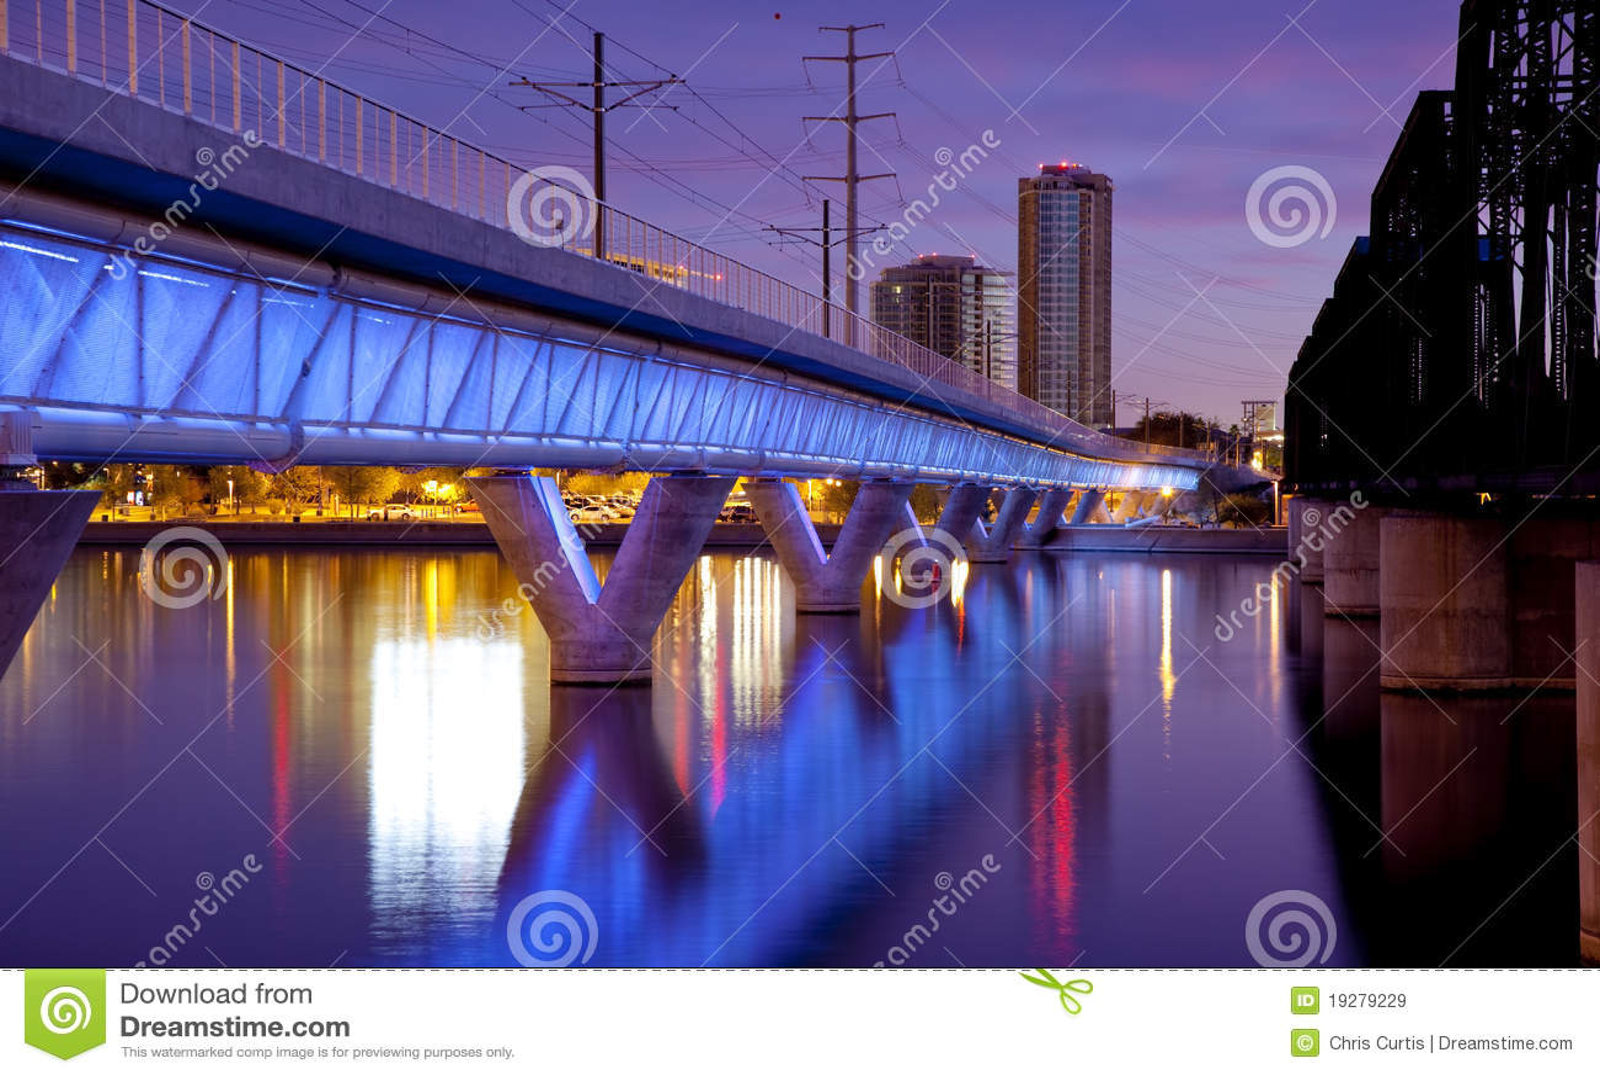 Tempe Arizona Light Rail Bridge and City